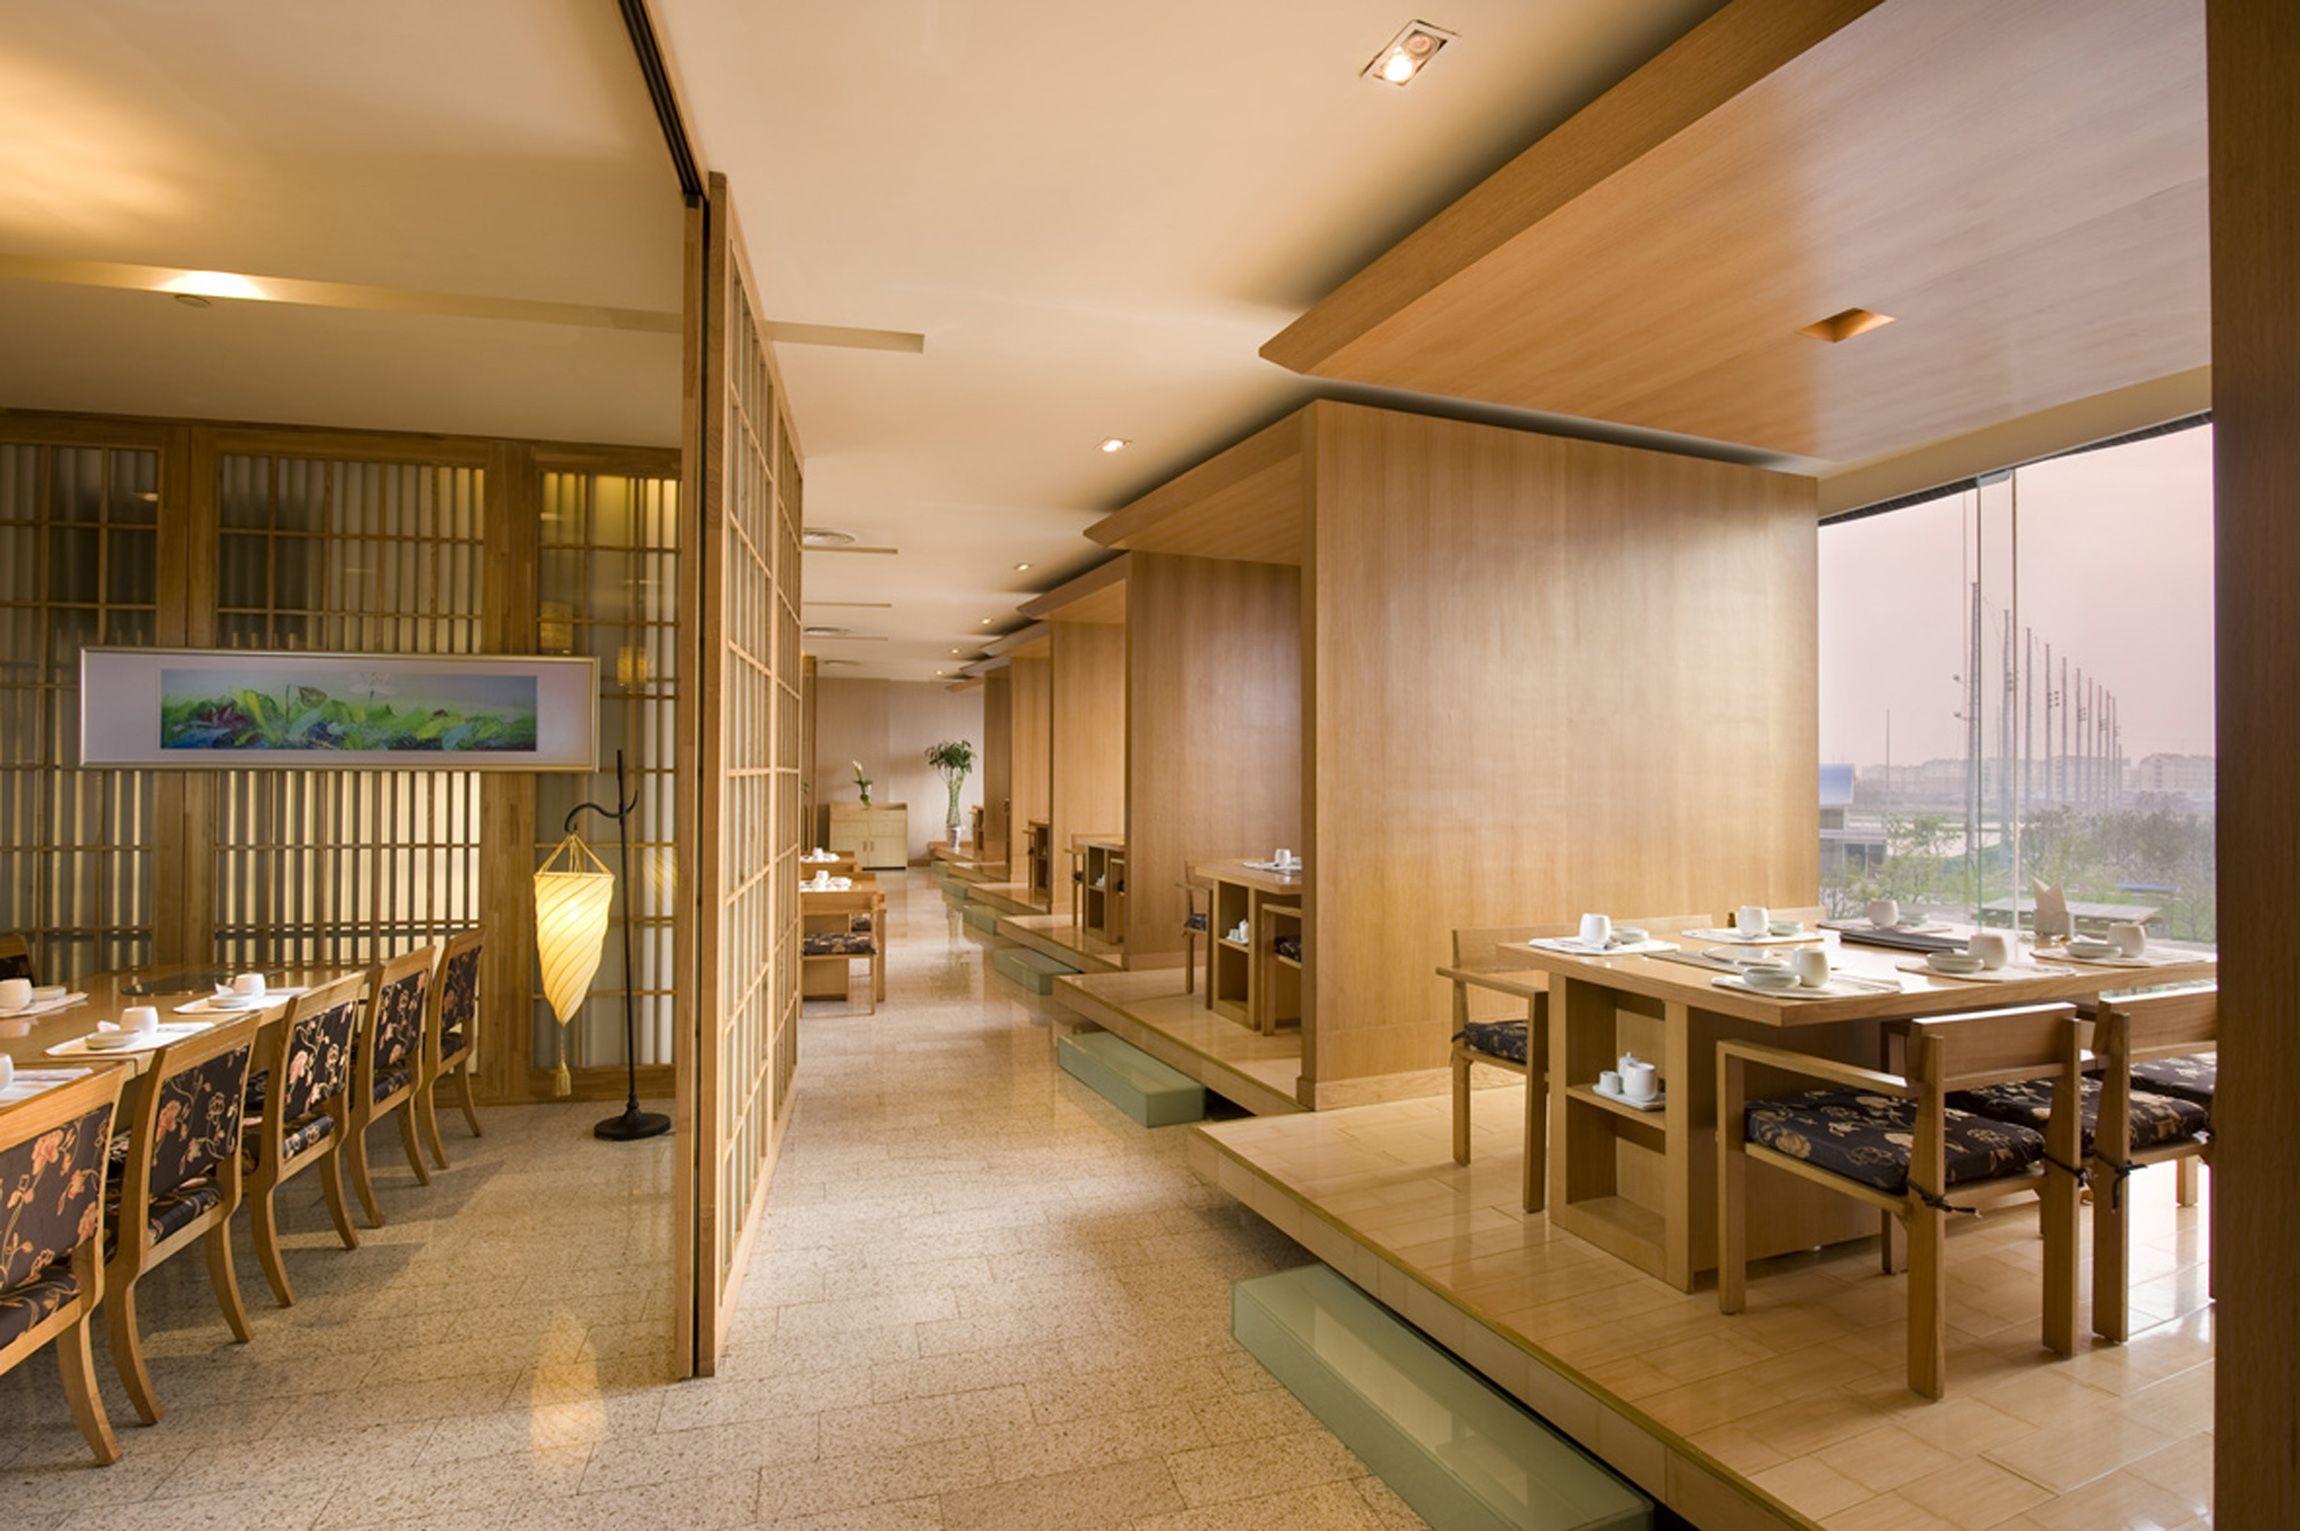 korean interior design 인테리어 카페 인테리어 레스토랑 디자인 on kitchen interior korean id=36255